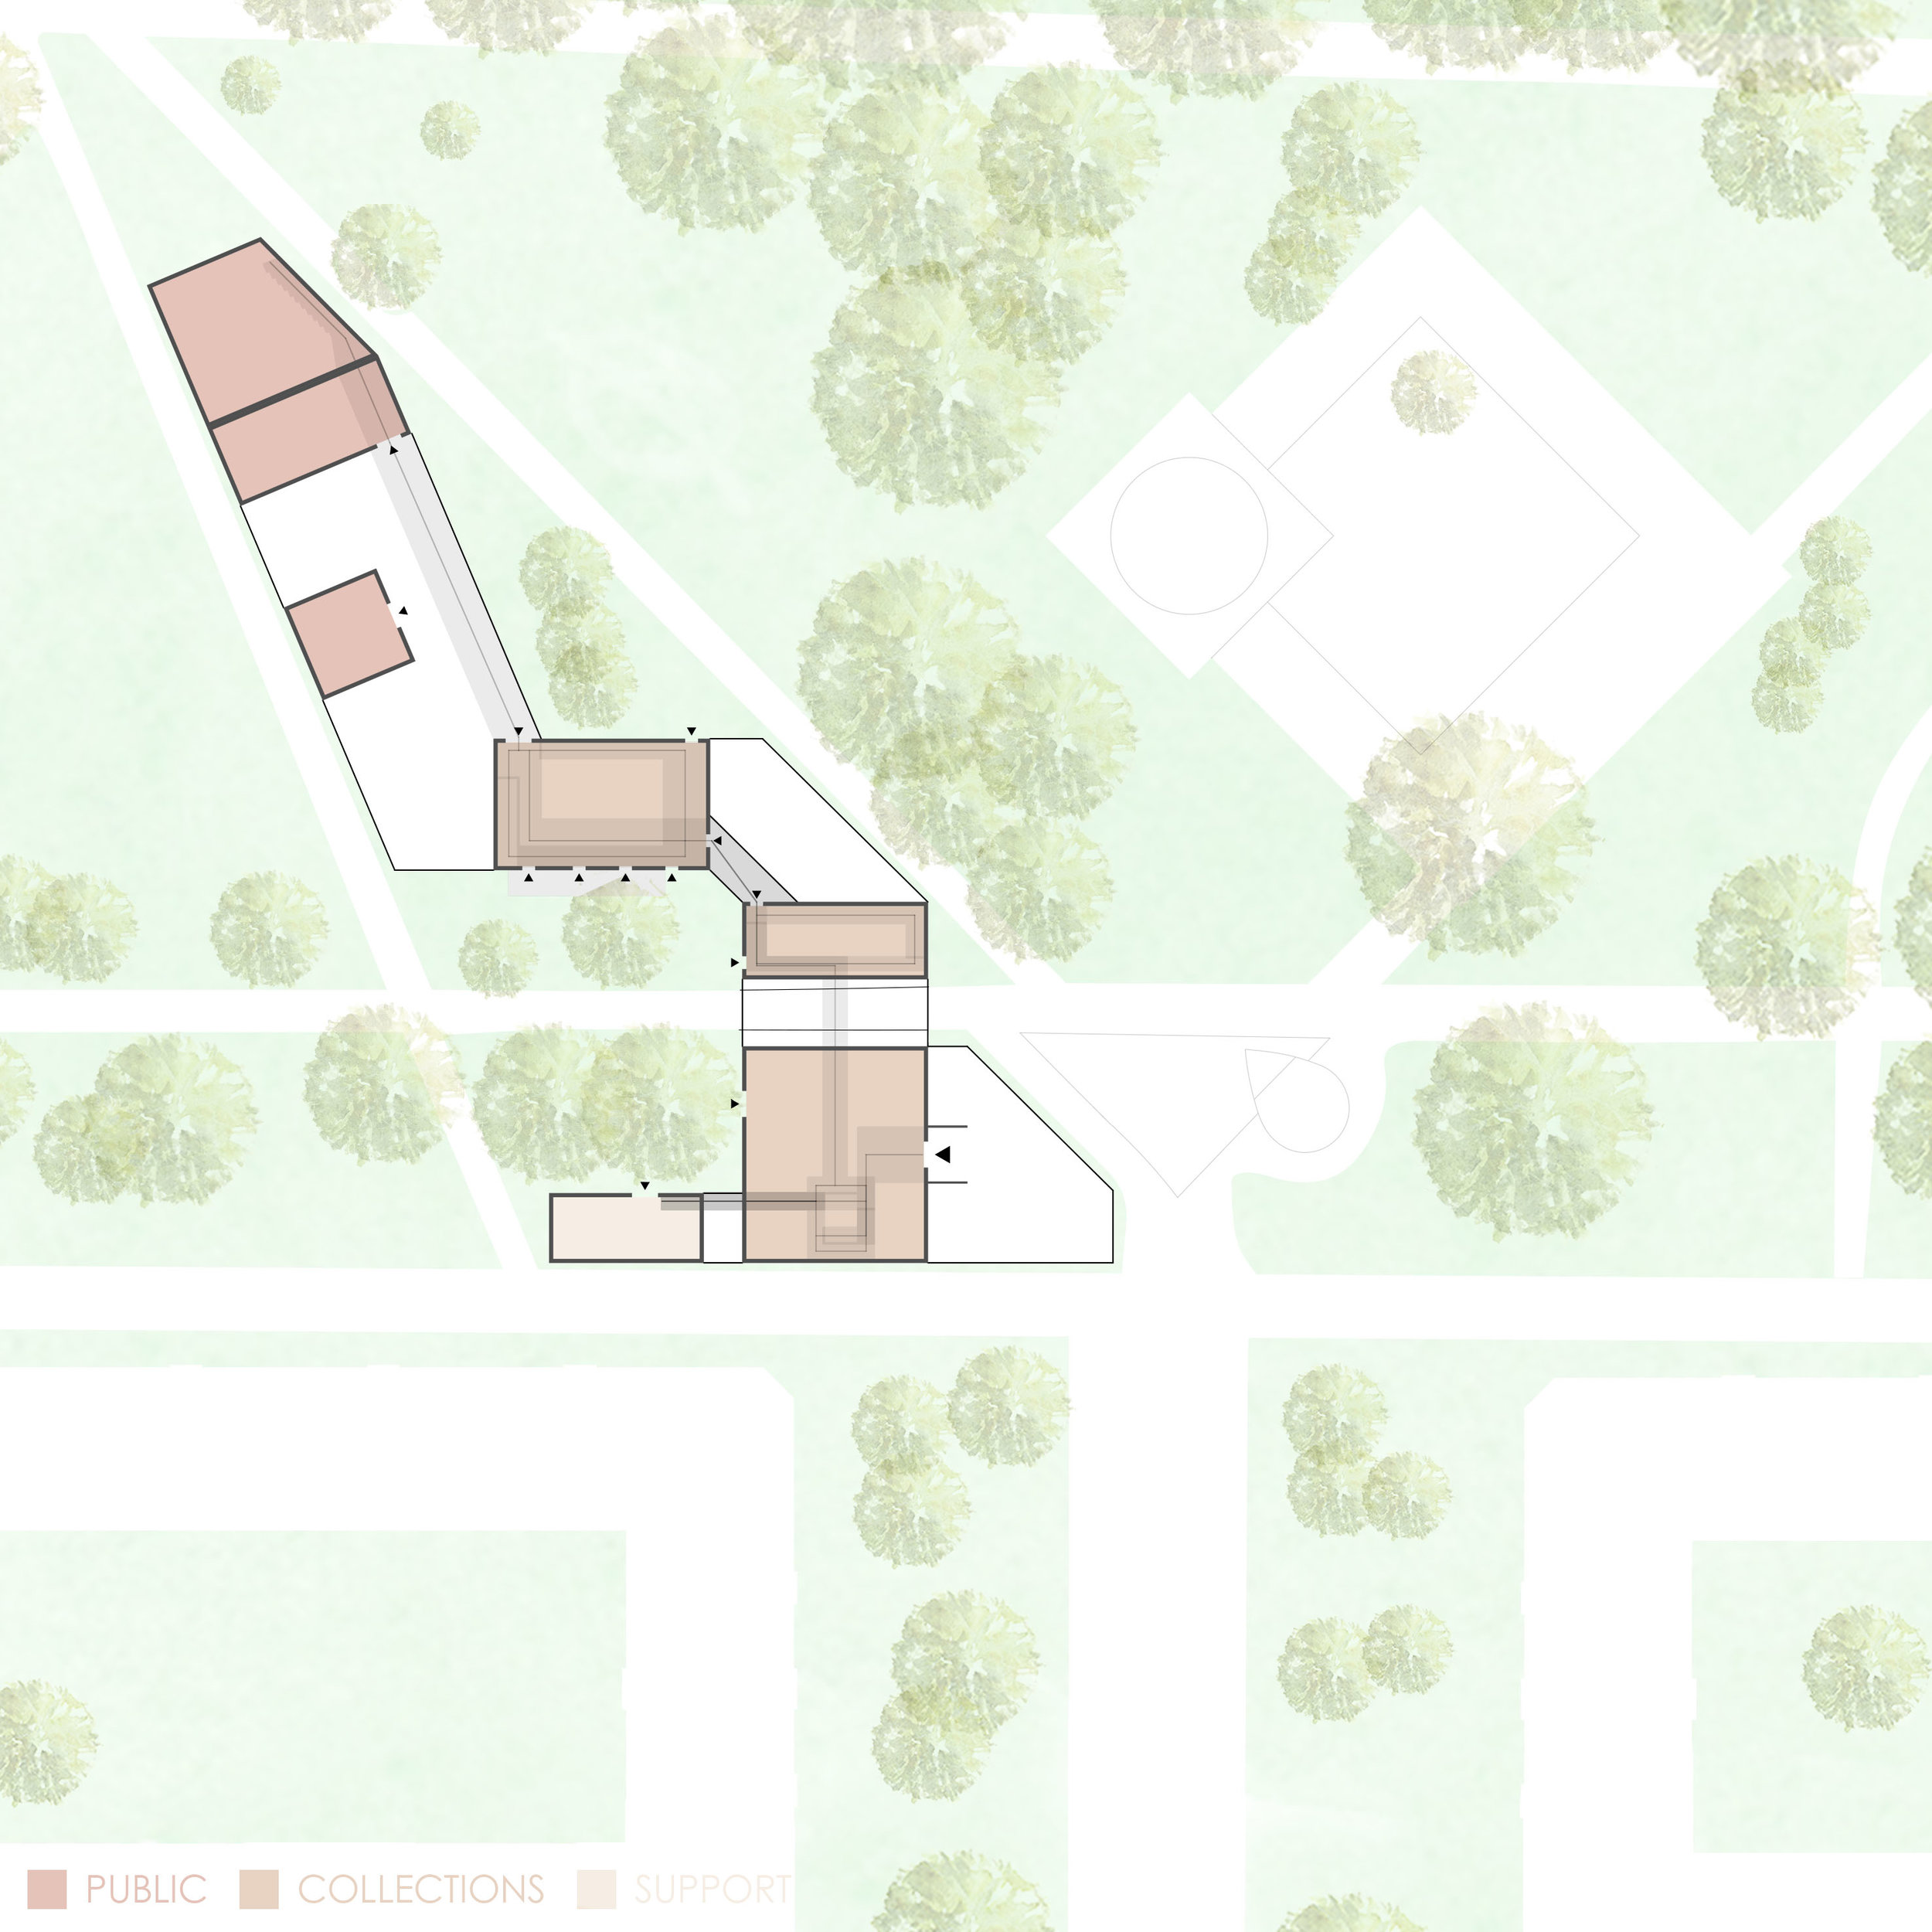 site plan diagram - after - portfolio.jpg